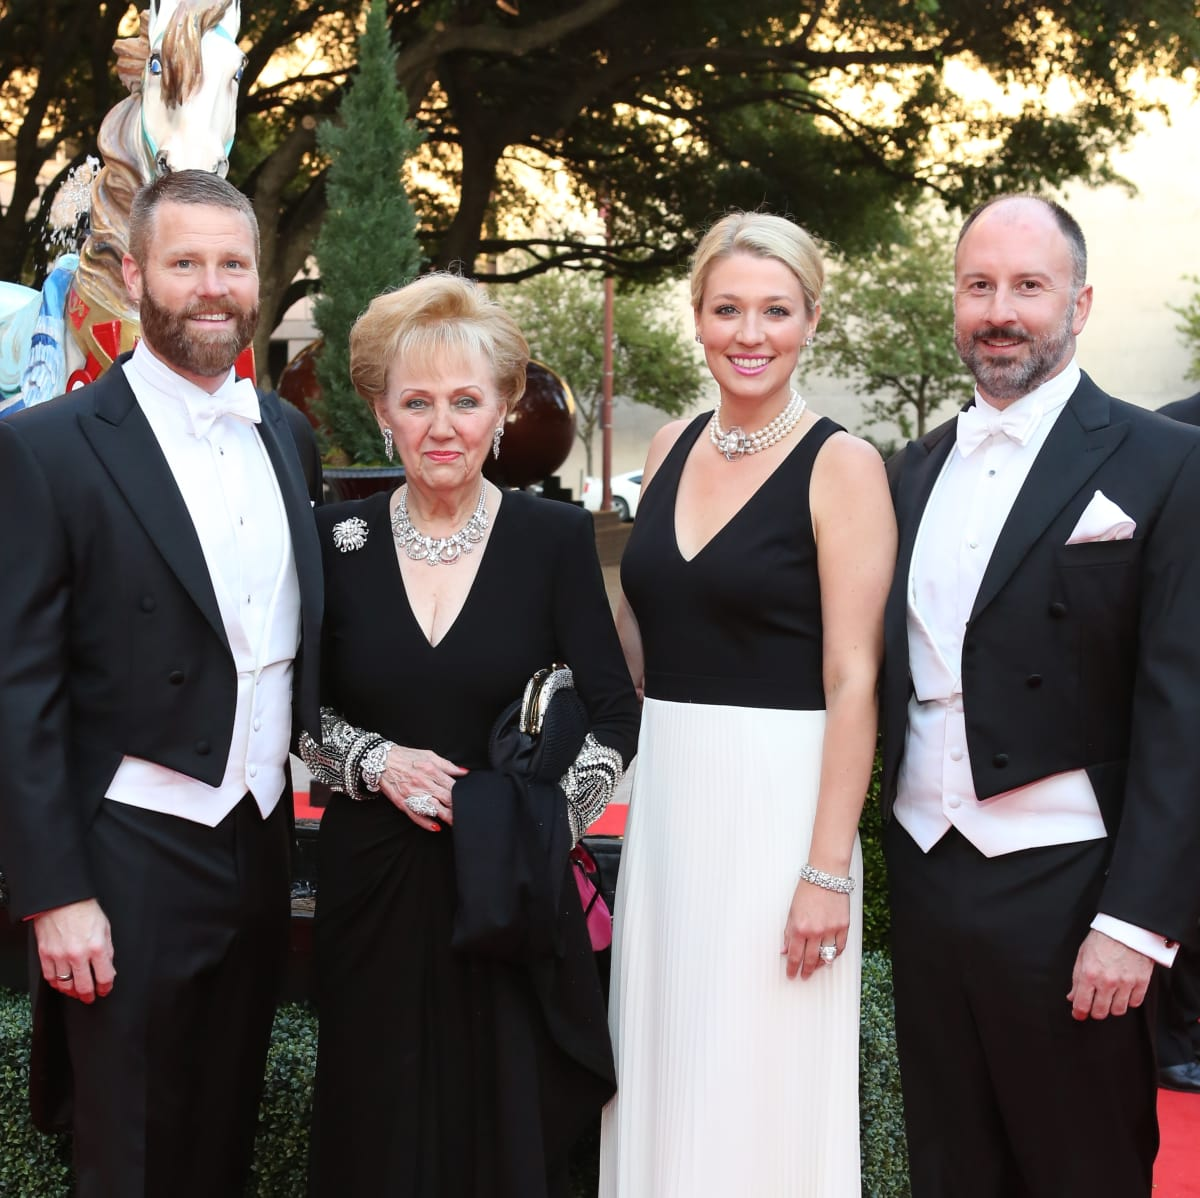 Houston Grand Opera Ball, 4/16 Kevin Black, Marguerite Swartz, Christina Stith, Tony Bradfield